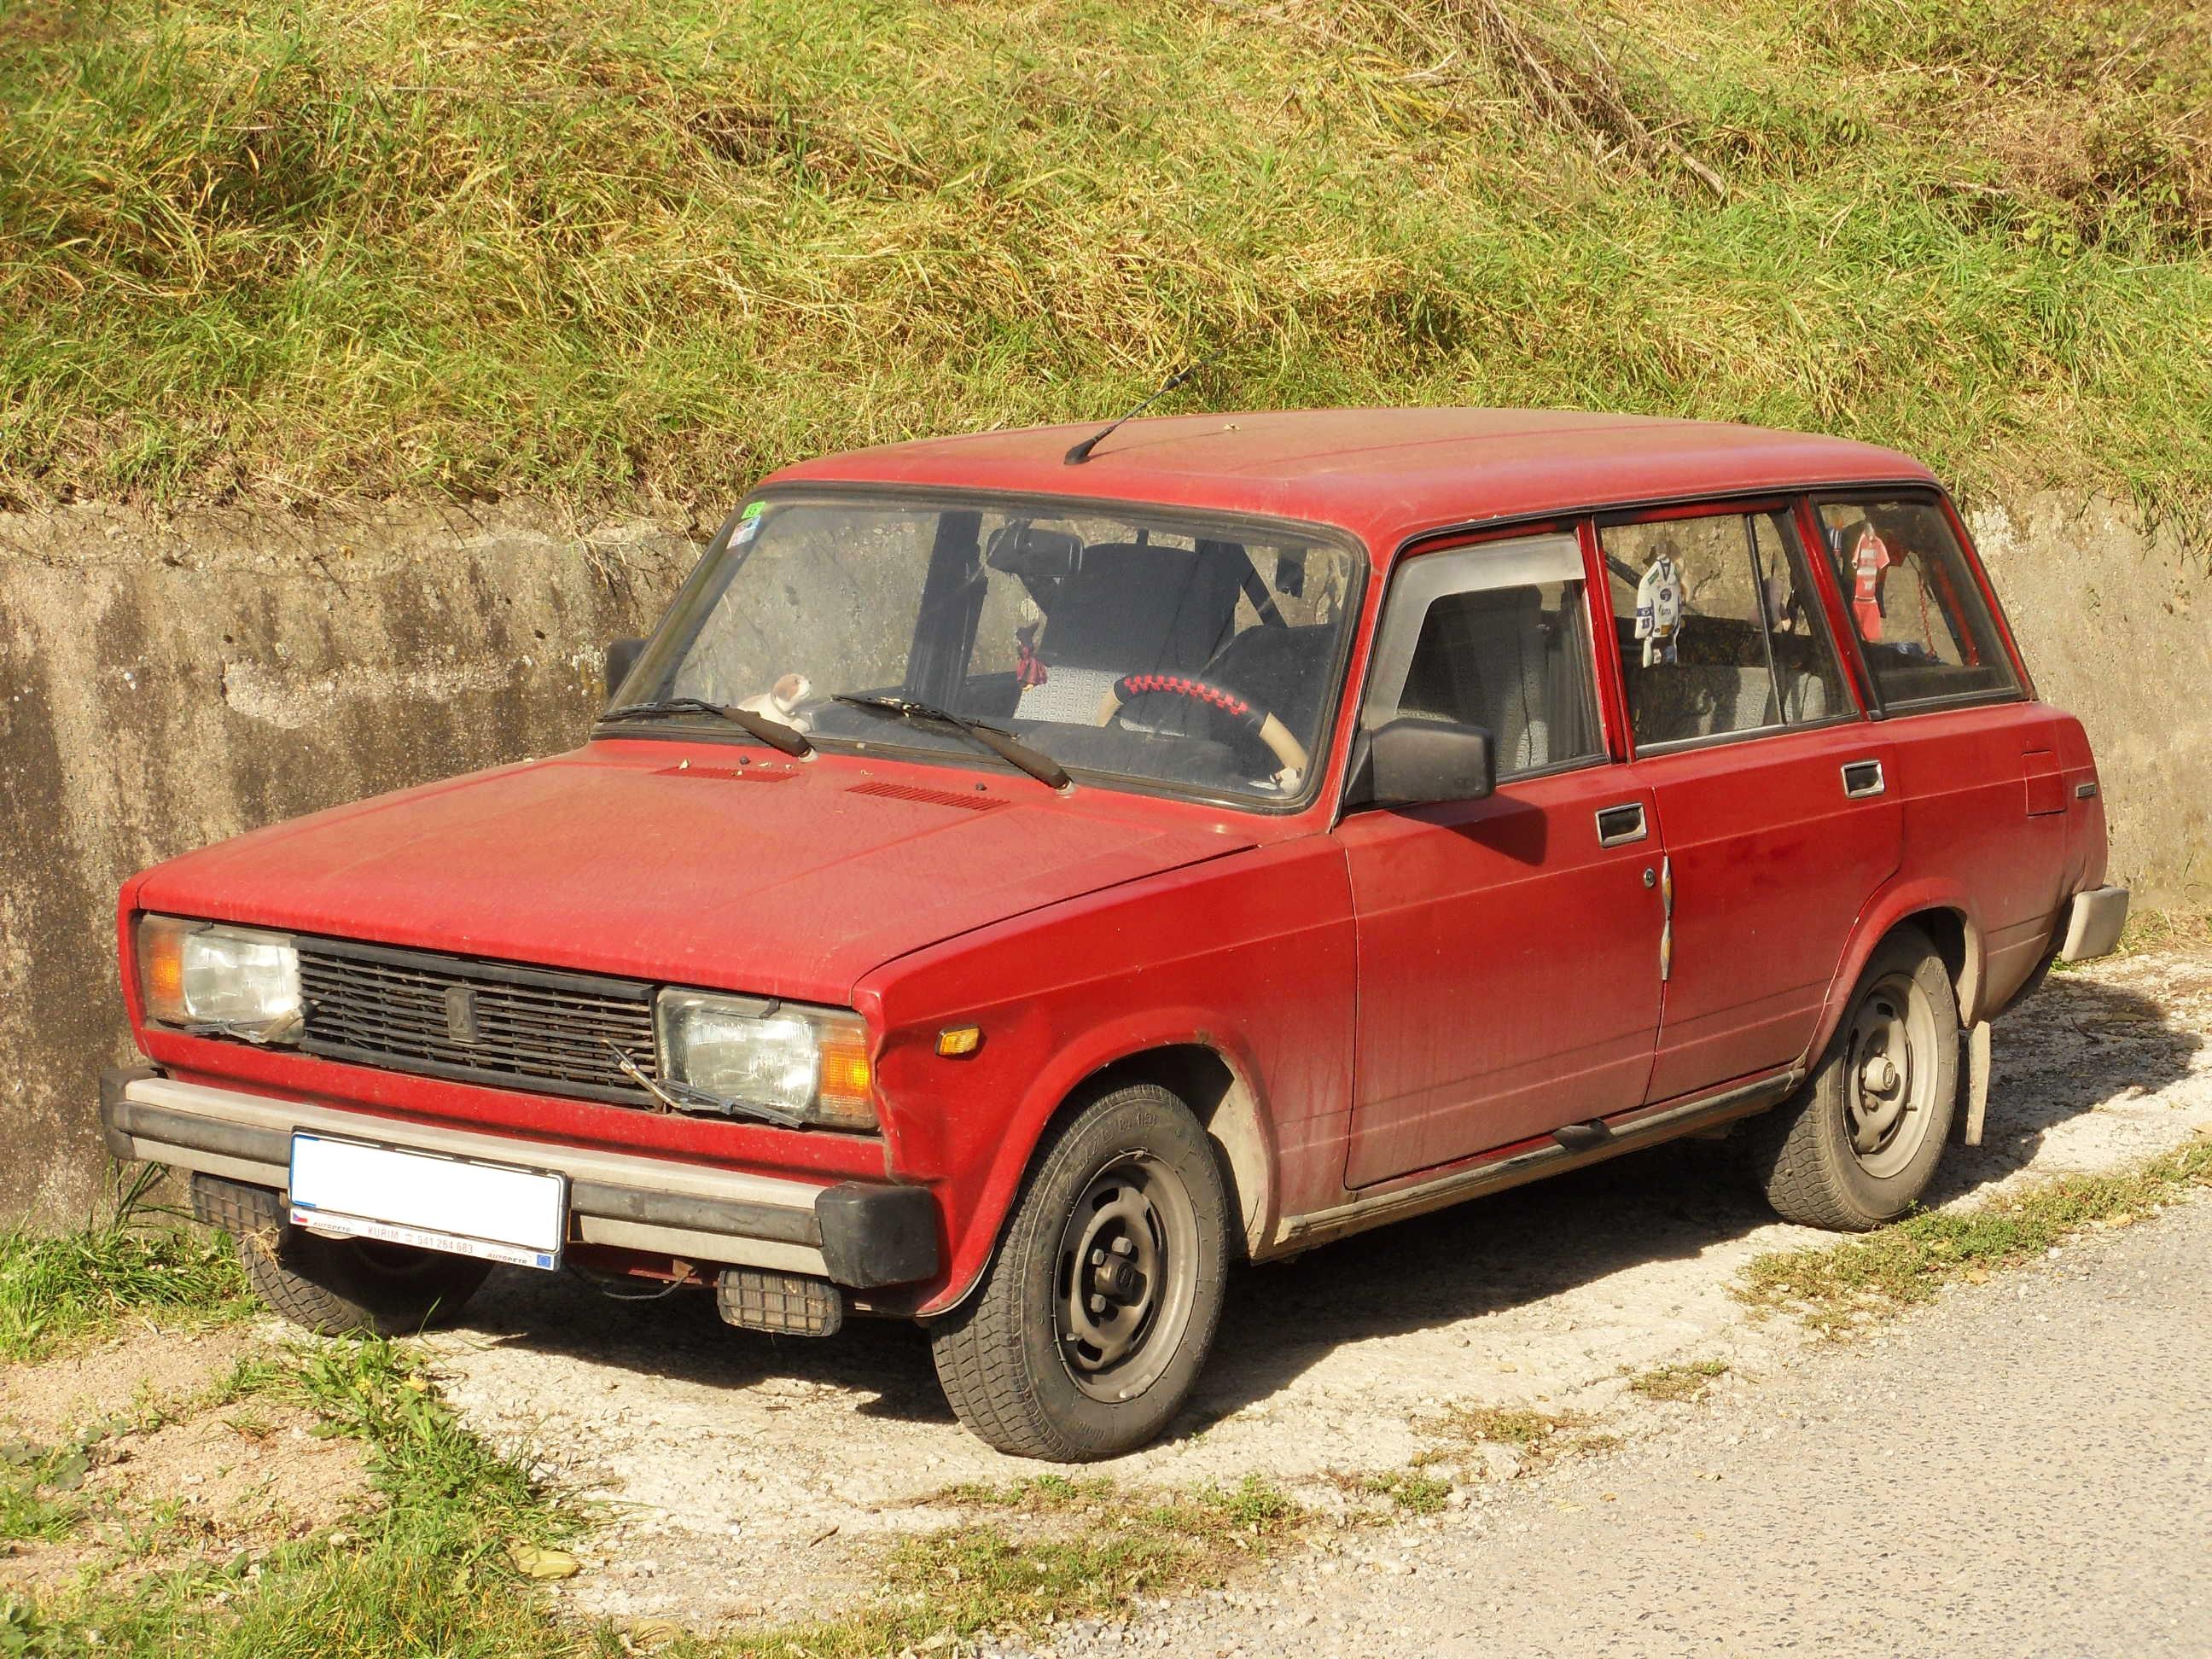 File:Lelekovice, Lada 2104.jpg